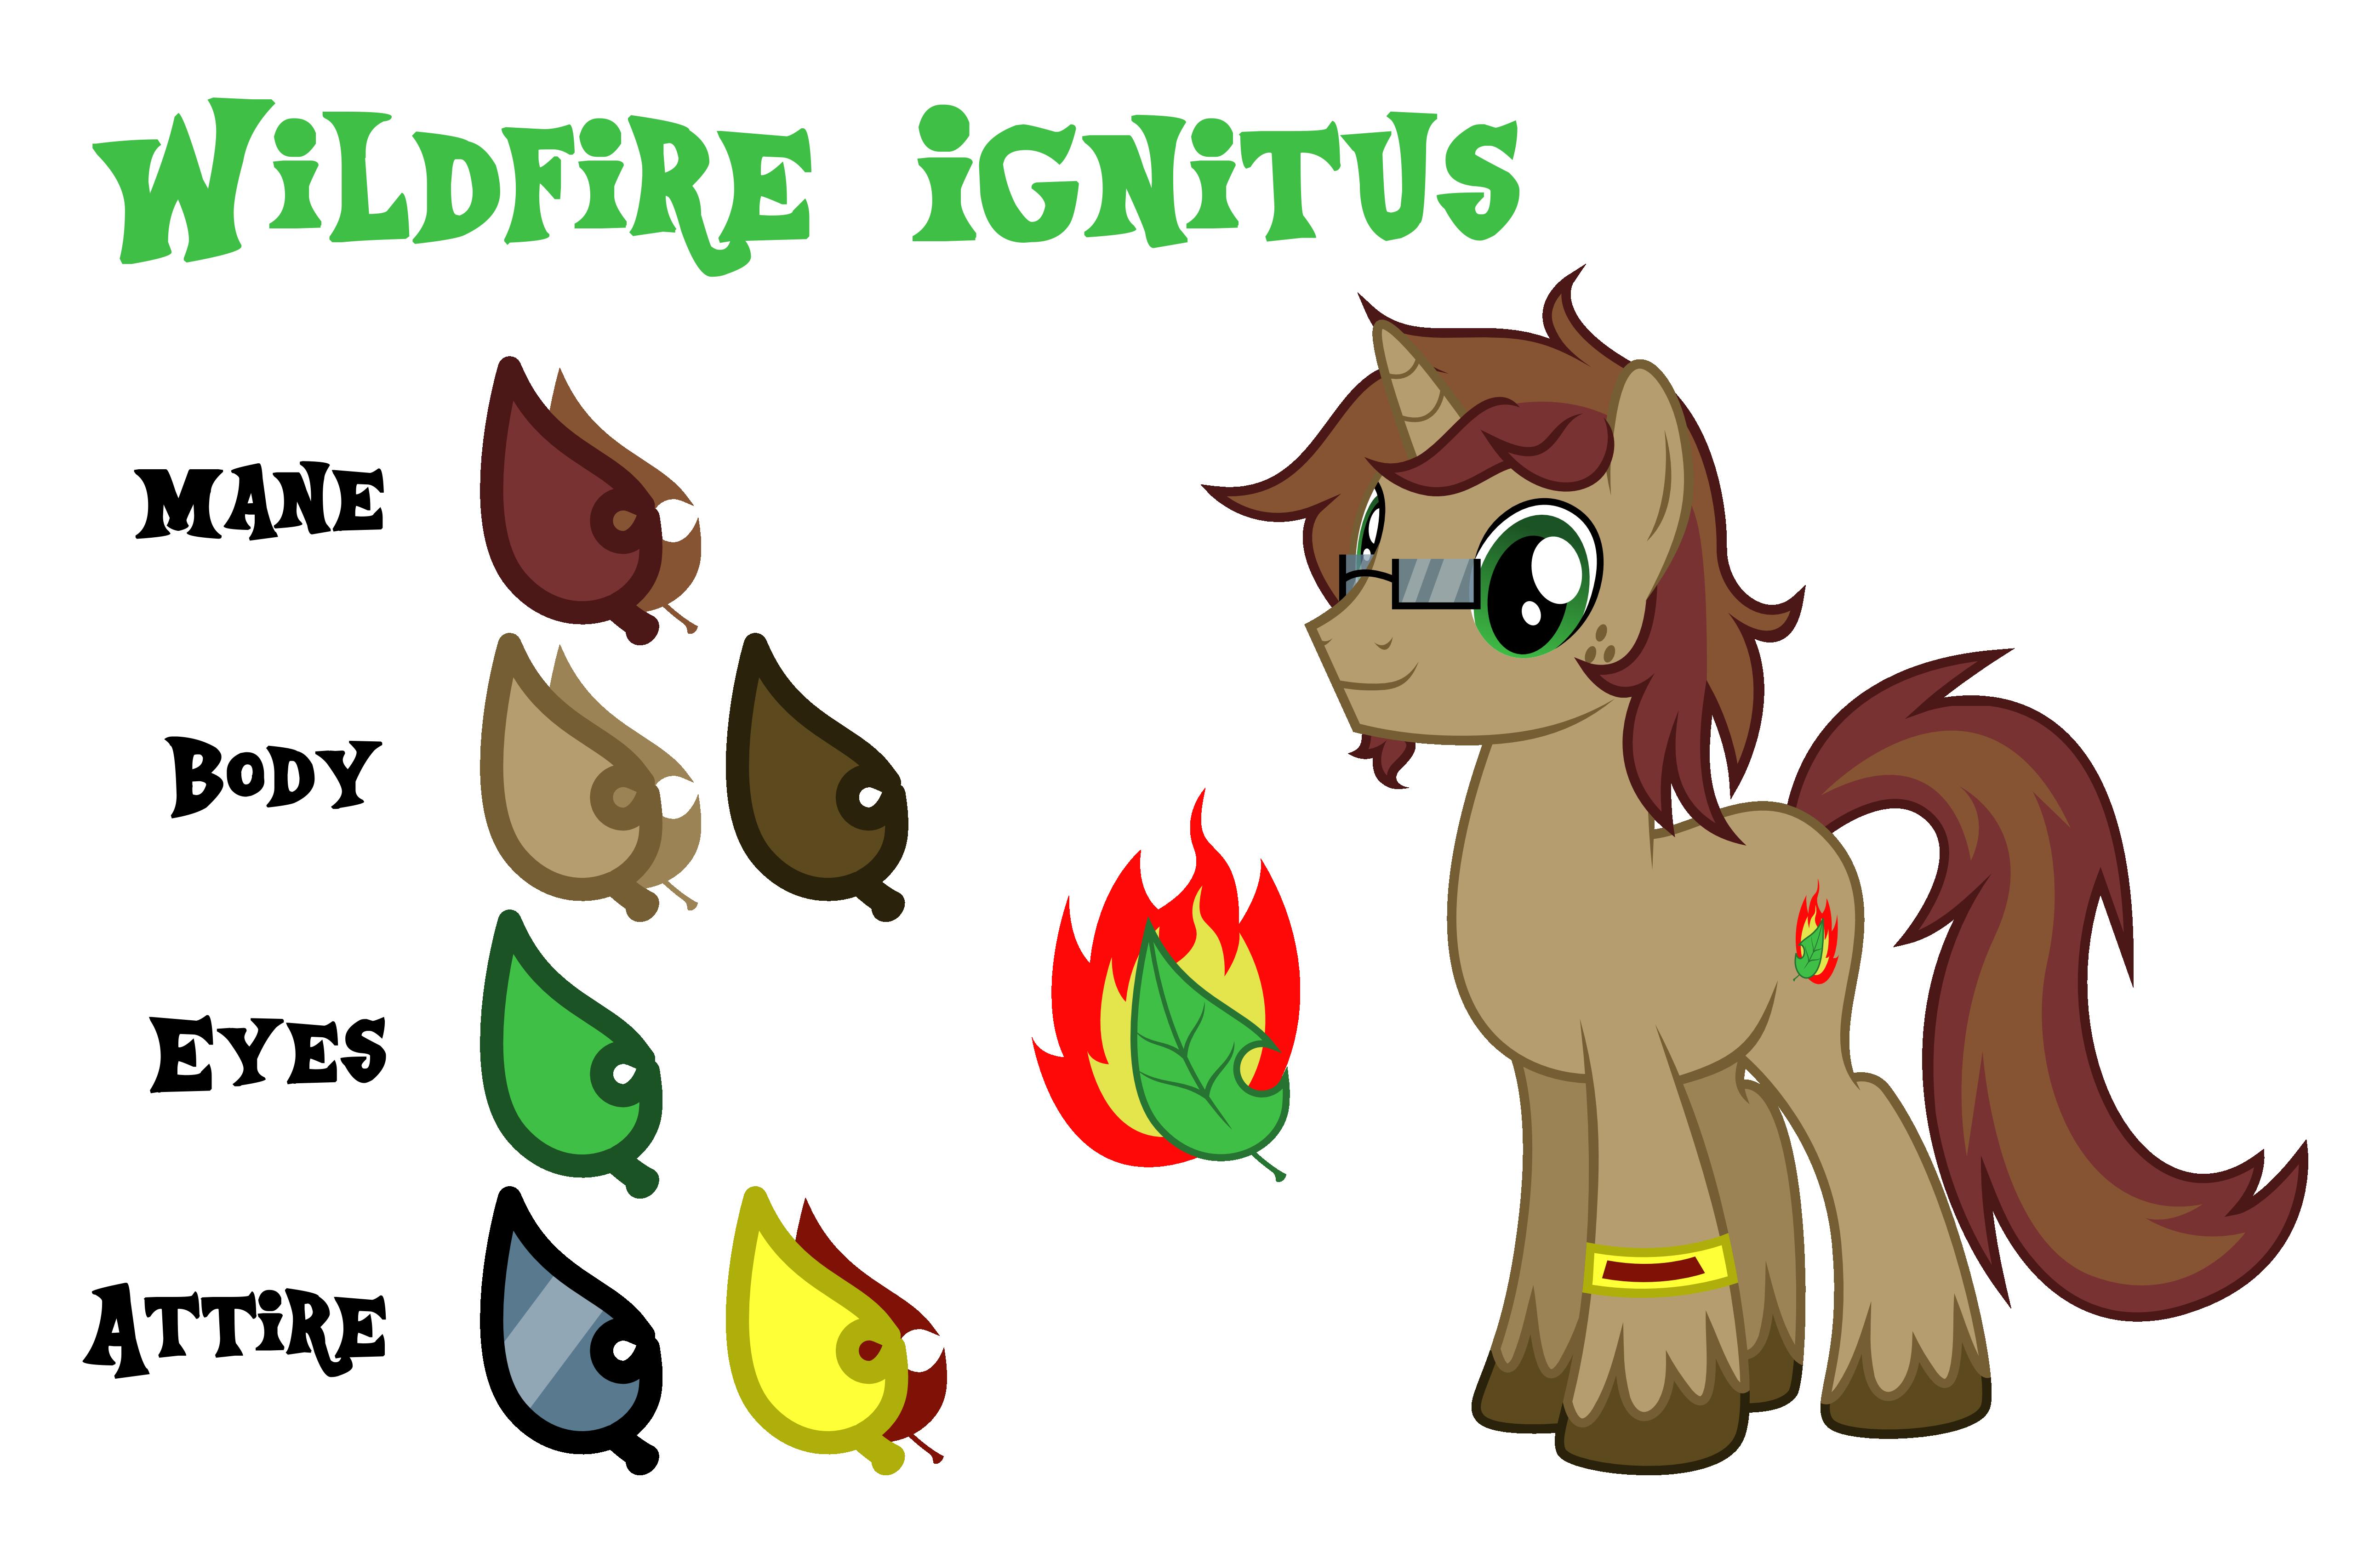 wildfire_ignitus_reference_by_drakizora-